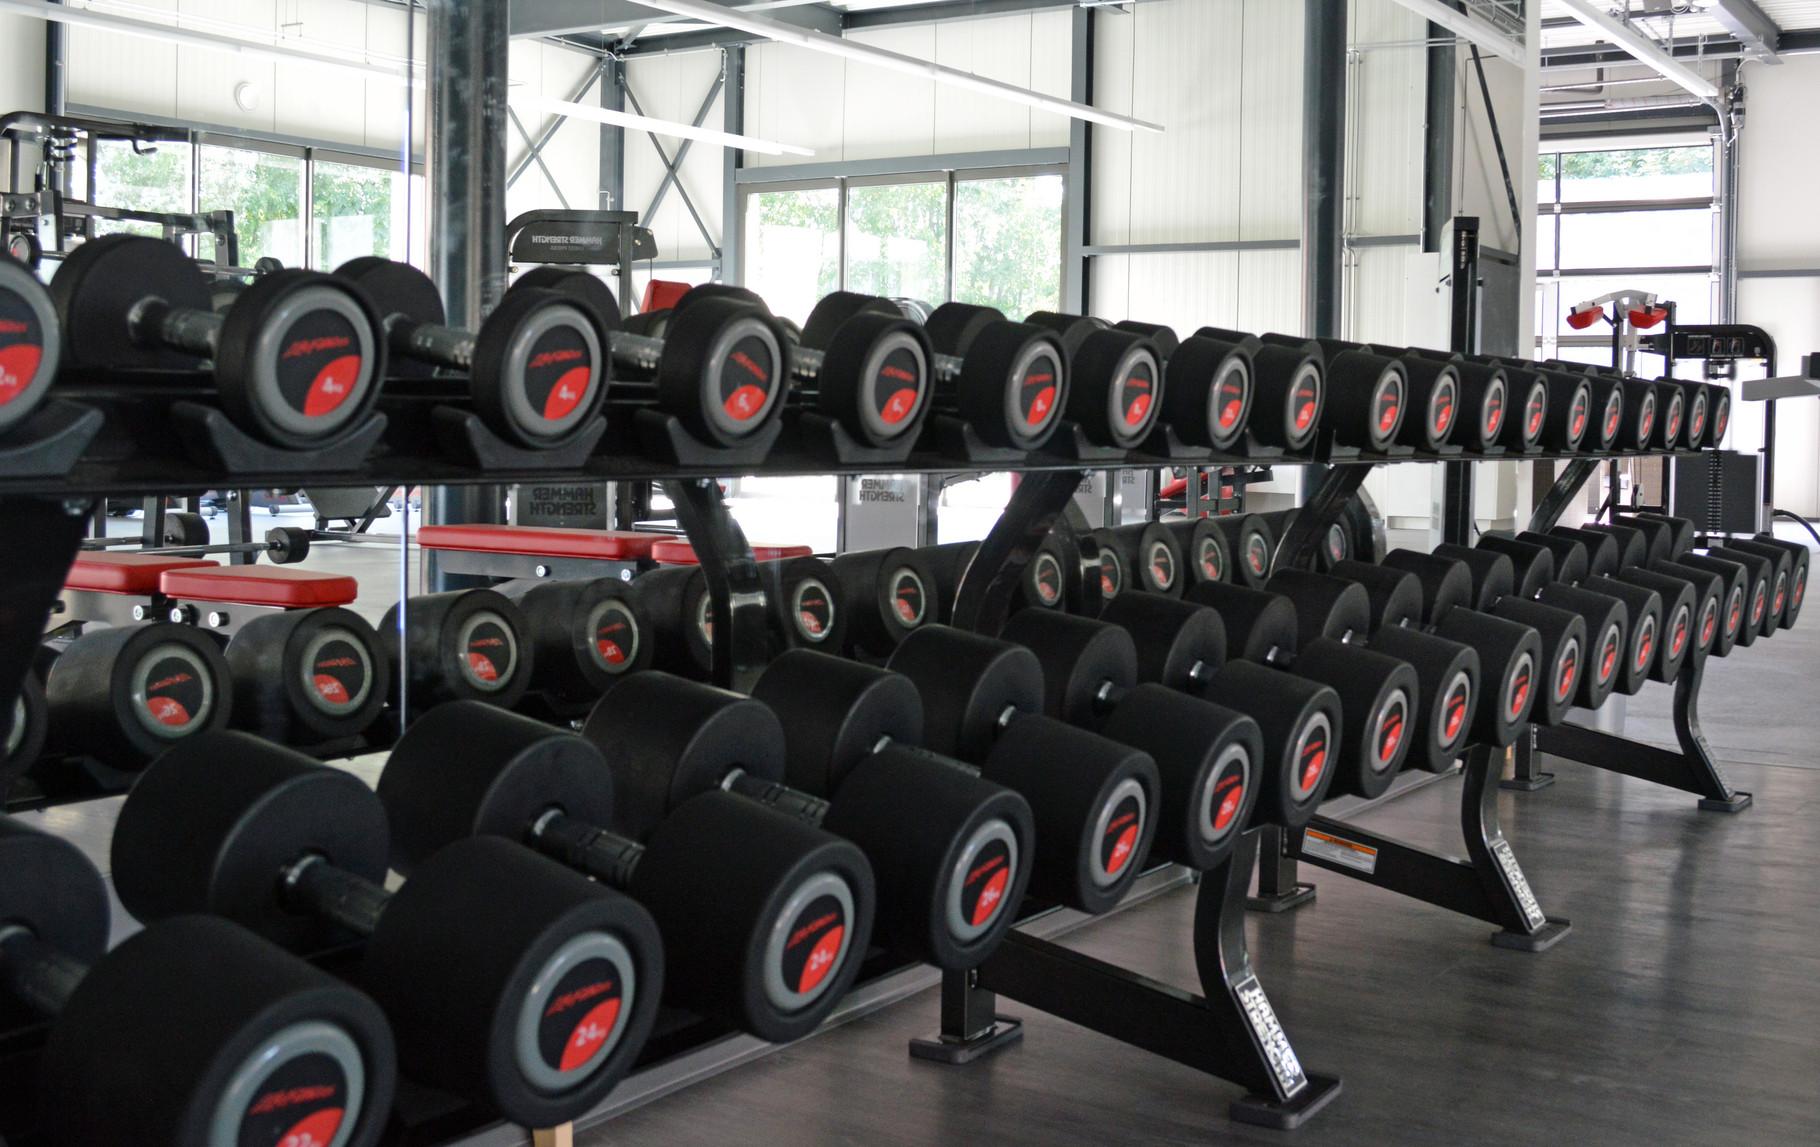 hantelbereich hammer strength fit54 das fitnesscenter in mellingen. Black Bedroom Furniture Sets. Home Design Ideas